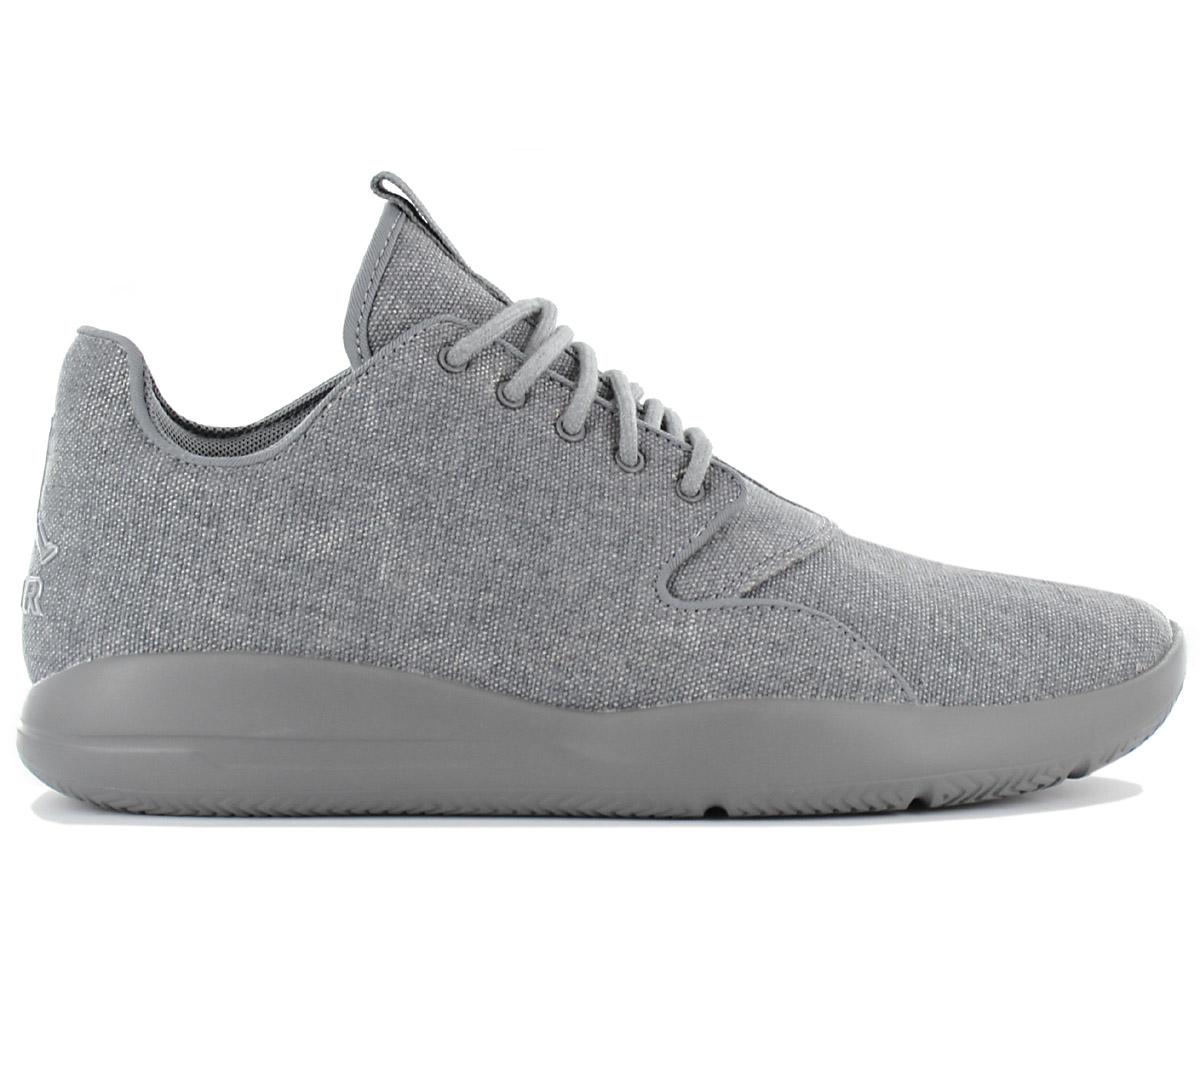 Nike AIR JORDAN JORDAN JORDAN Eclipse Chukka Herren Sneaker Schuhe Turnschuhe Mid Sportschuhe 31852e